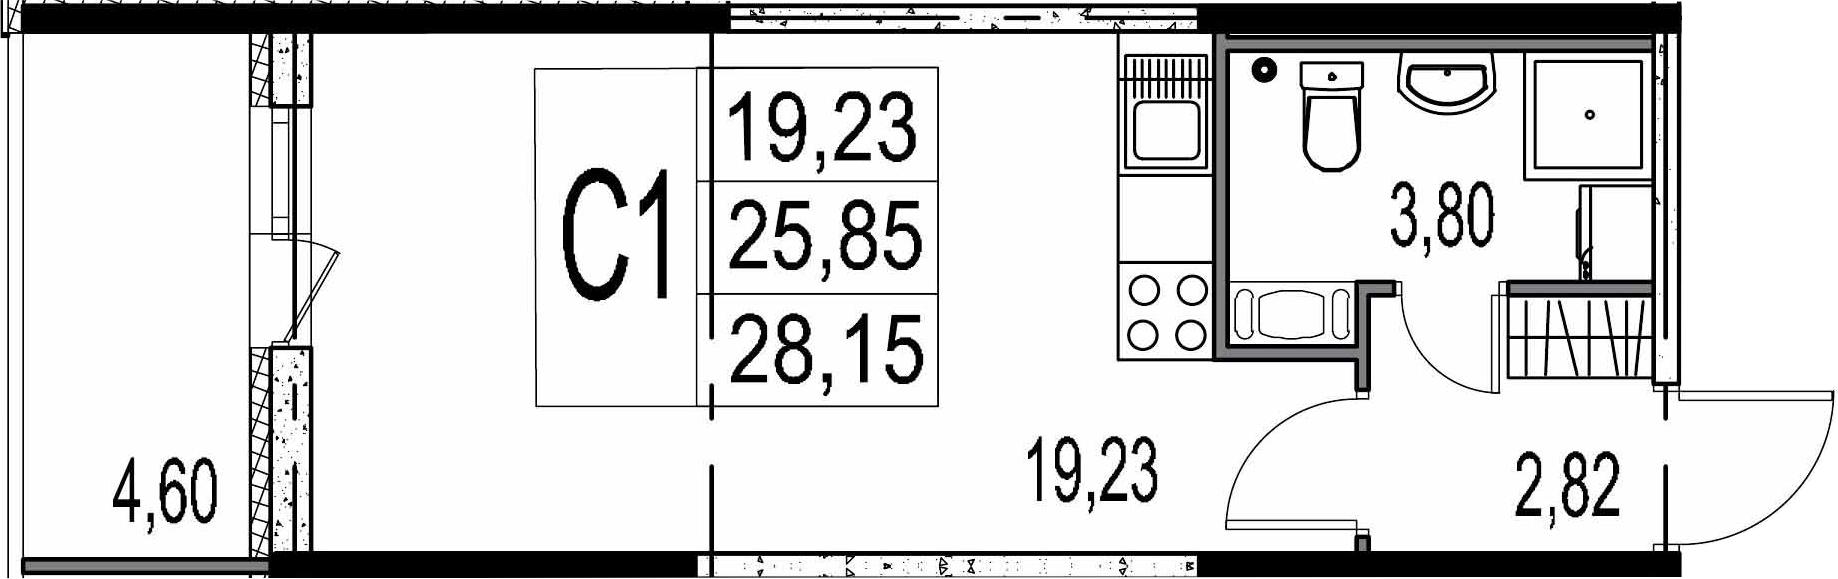 Студия 30 м<sup>2</sup> на 9 этаже